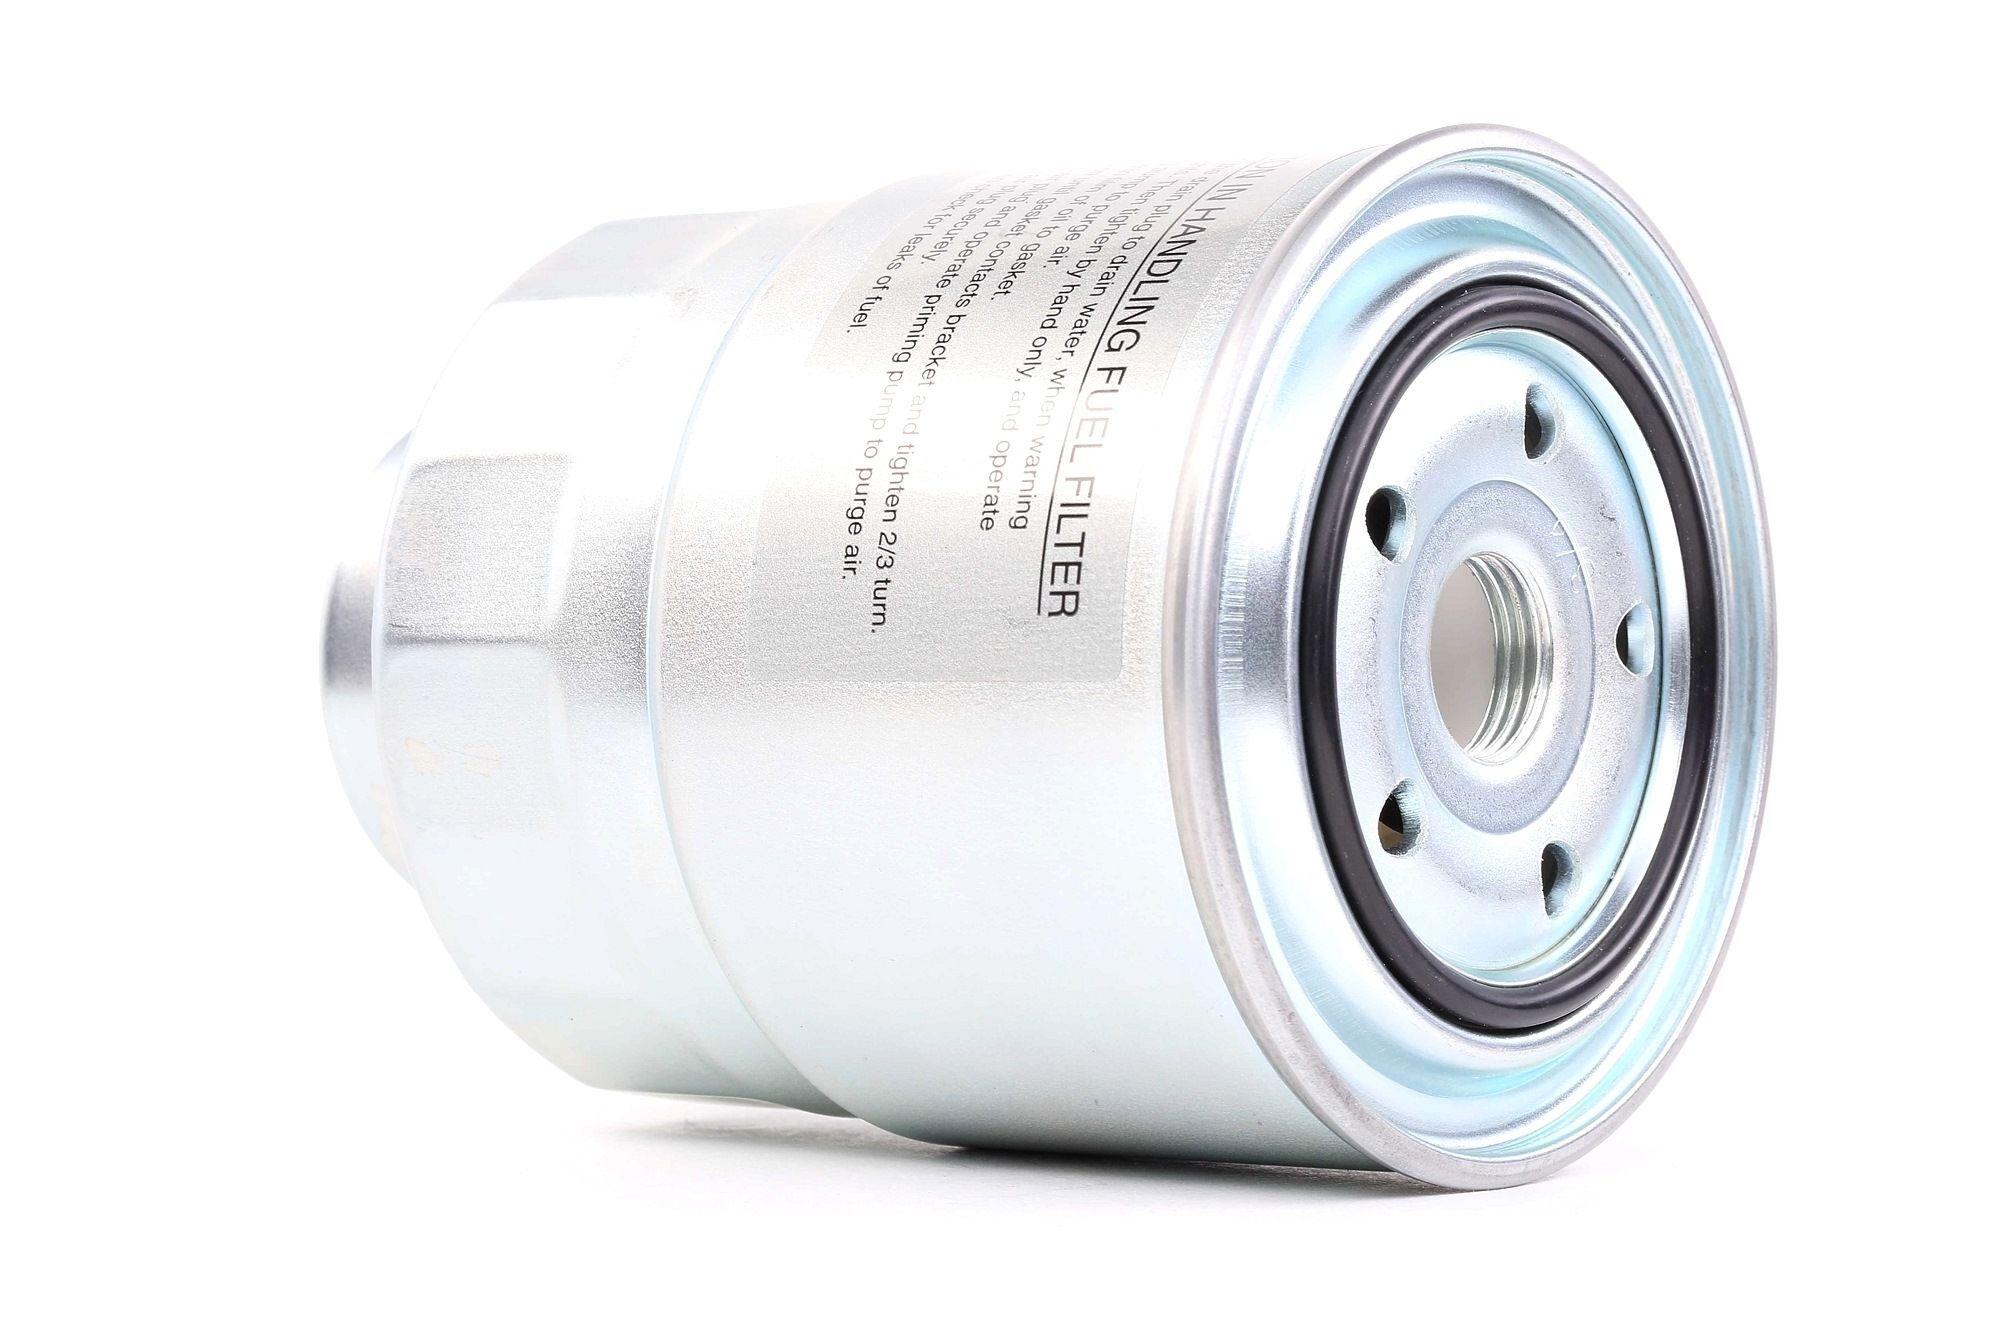 BOSCH Filtre à Carburant HONDA F 026 402 063 16901RJLE01,16901RMAE00,16901RMAE01 Filtre Fuel